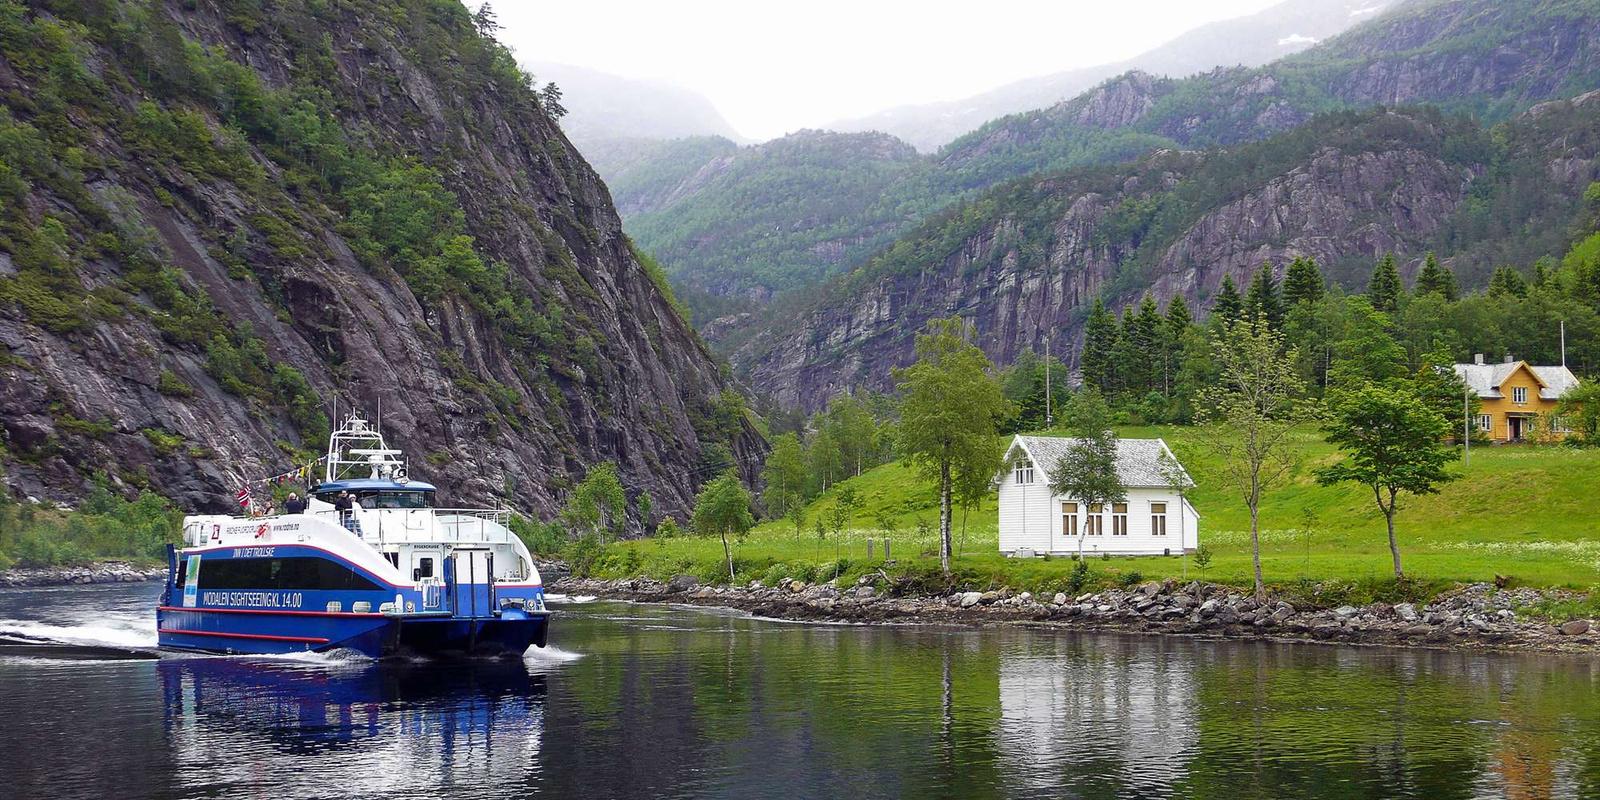 norvág fjord